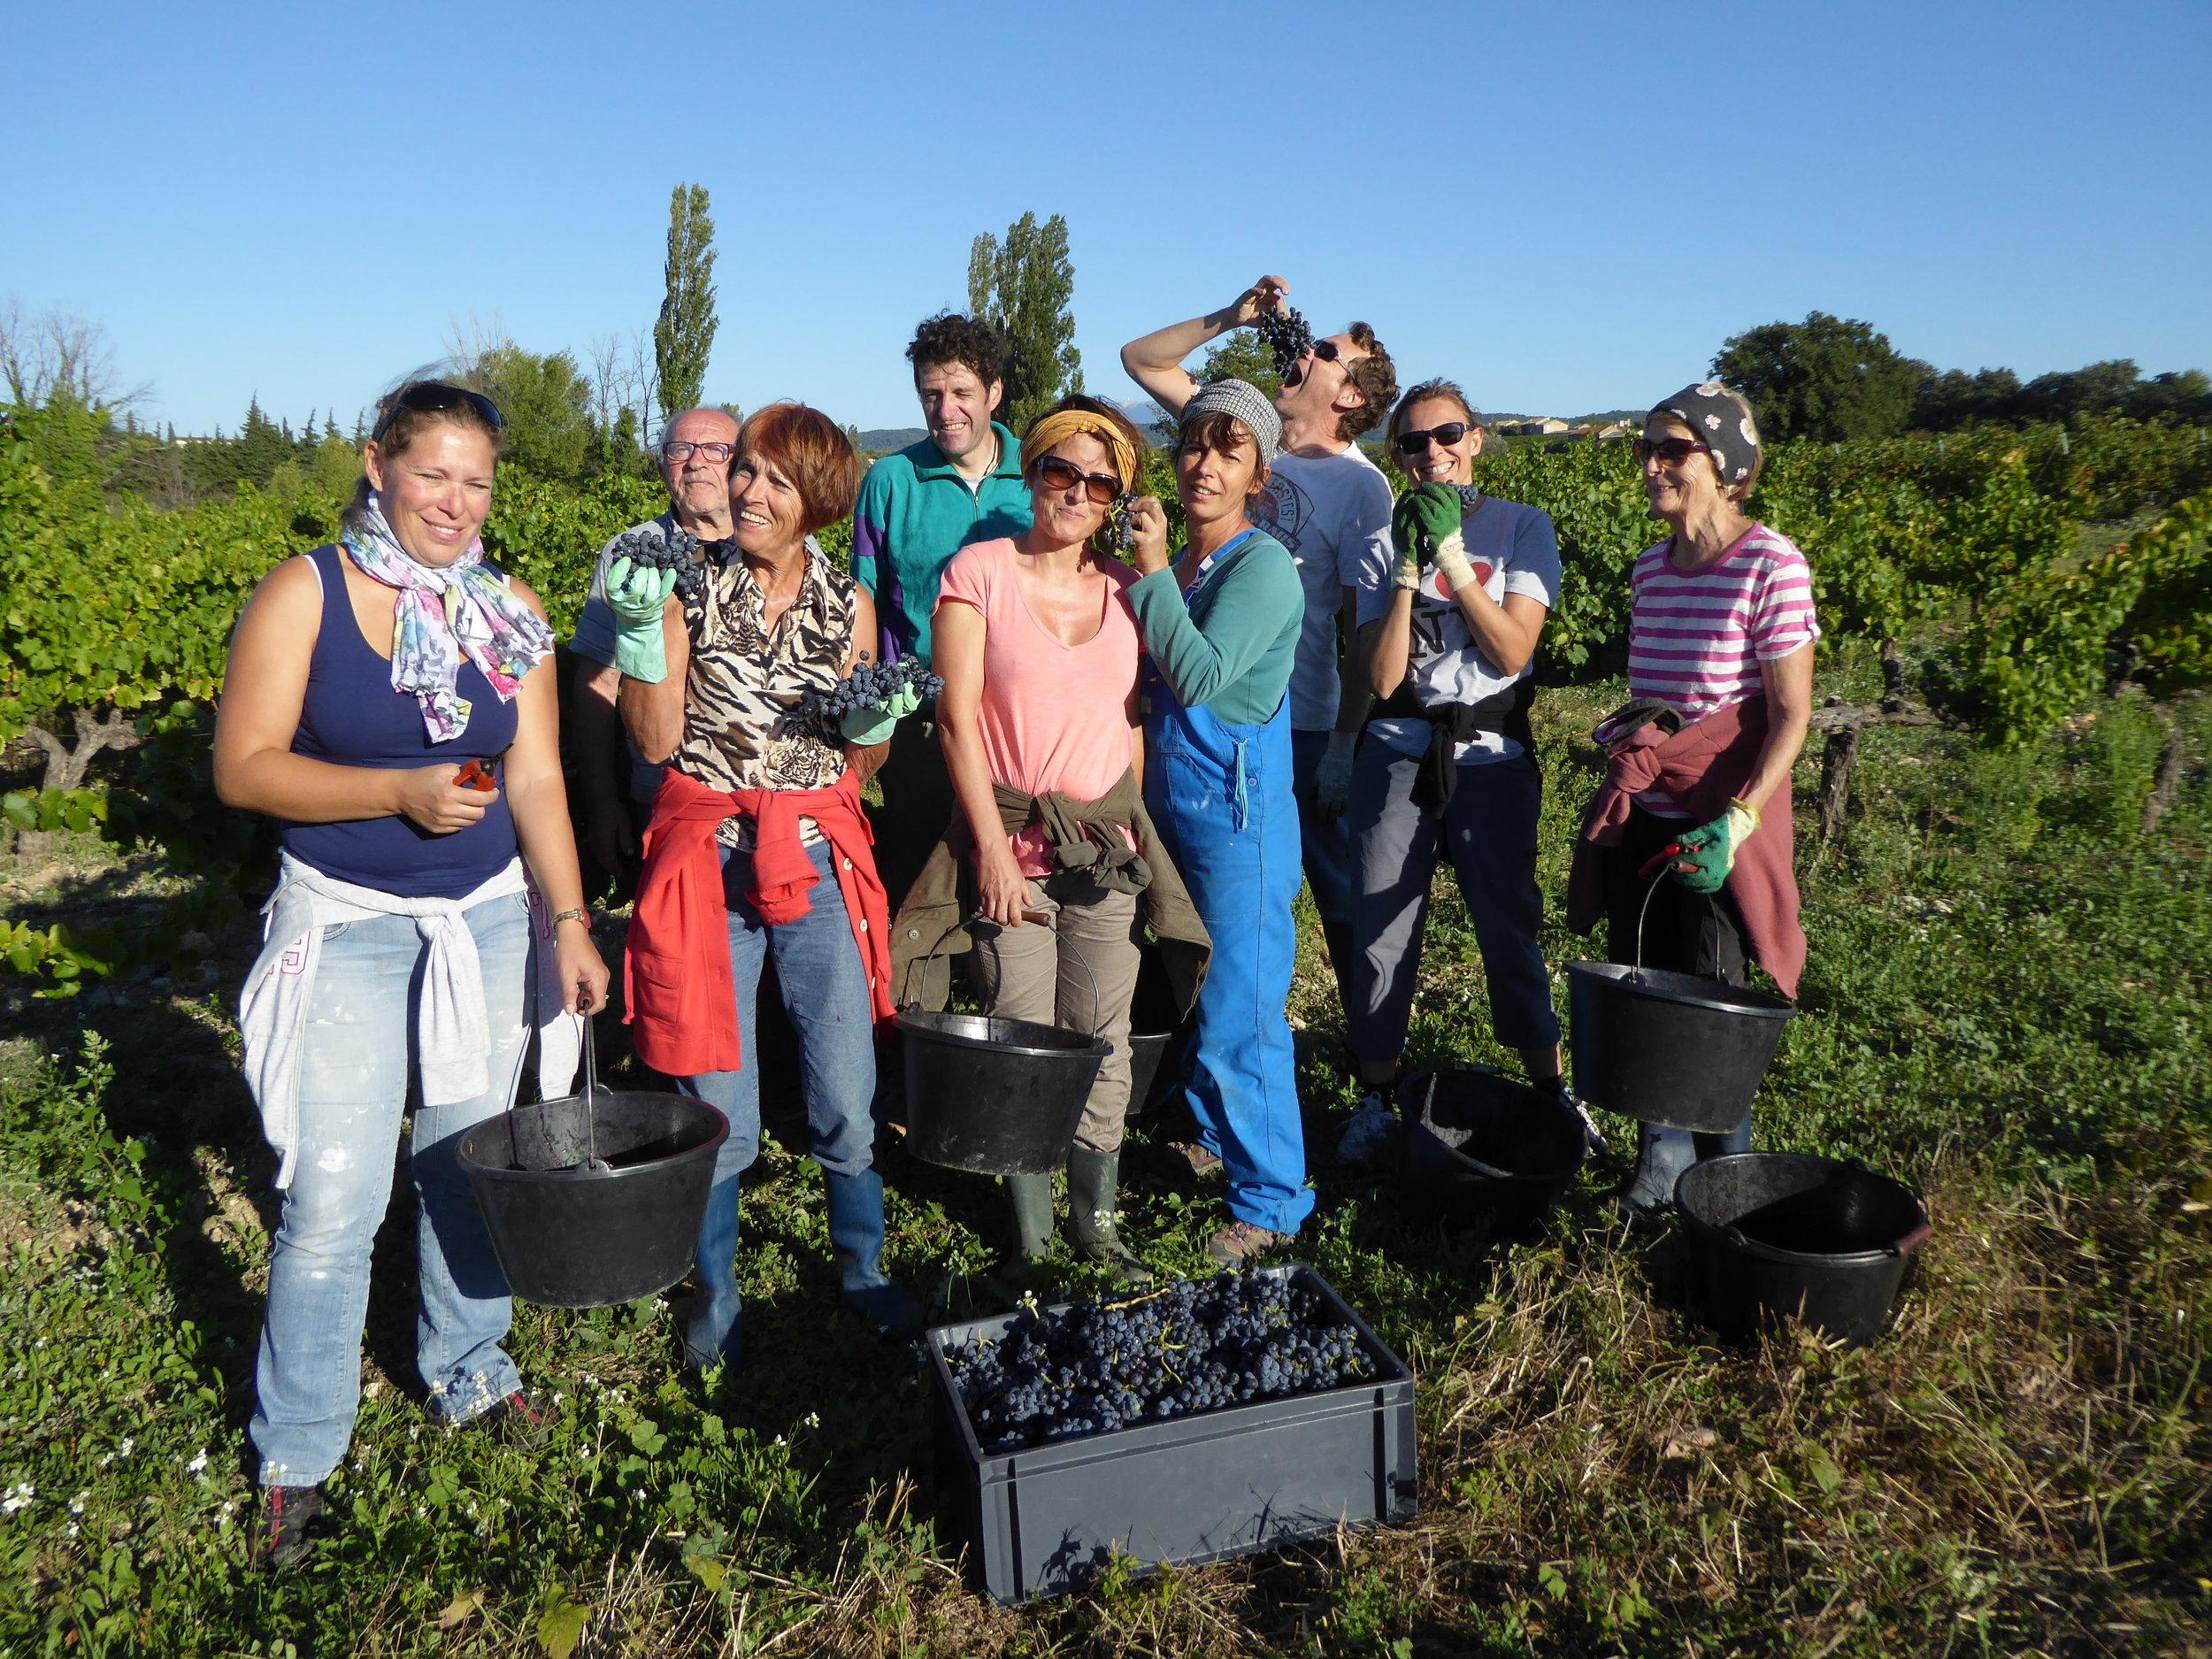 Harvest is a community effort